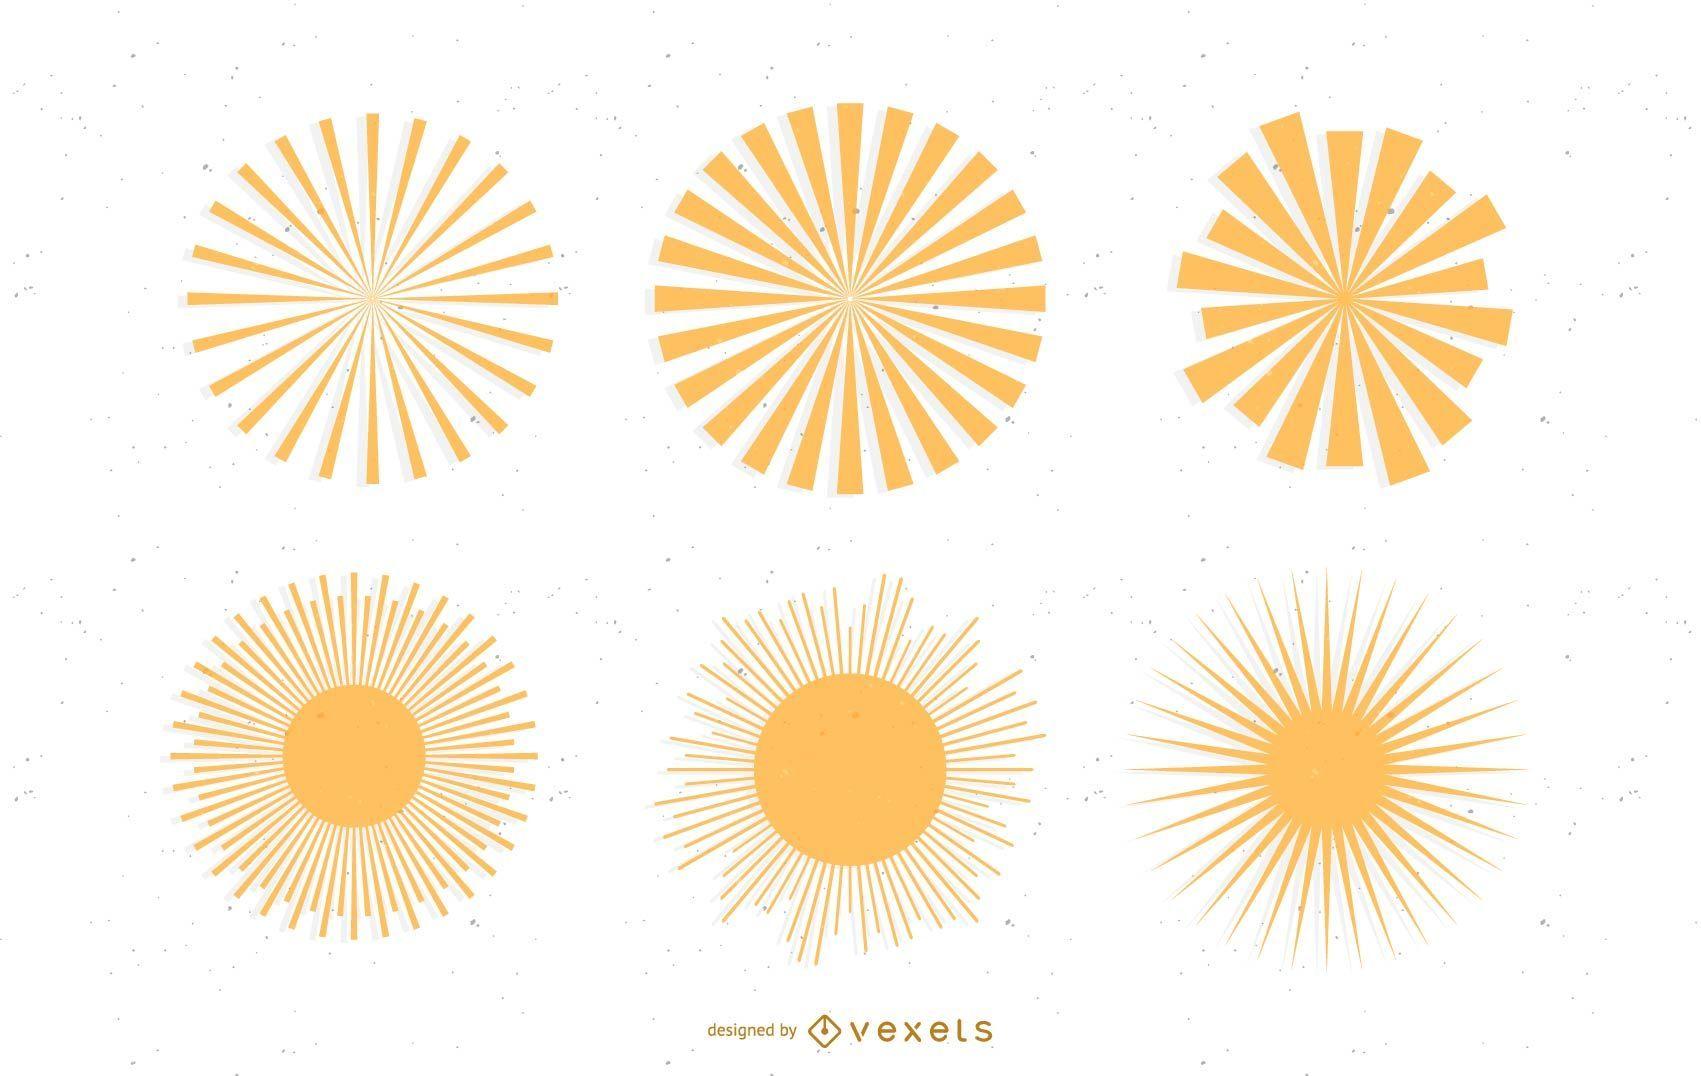 sun ray: svg vectors